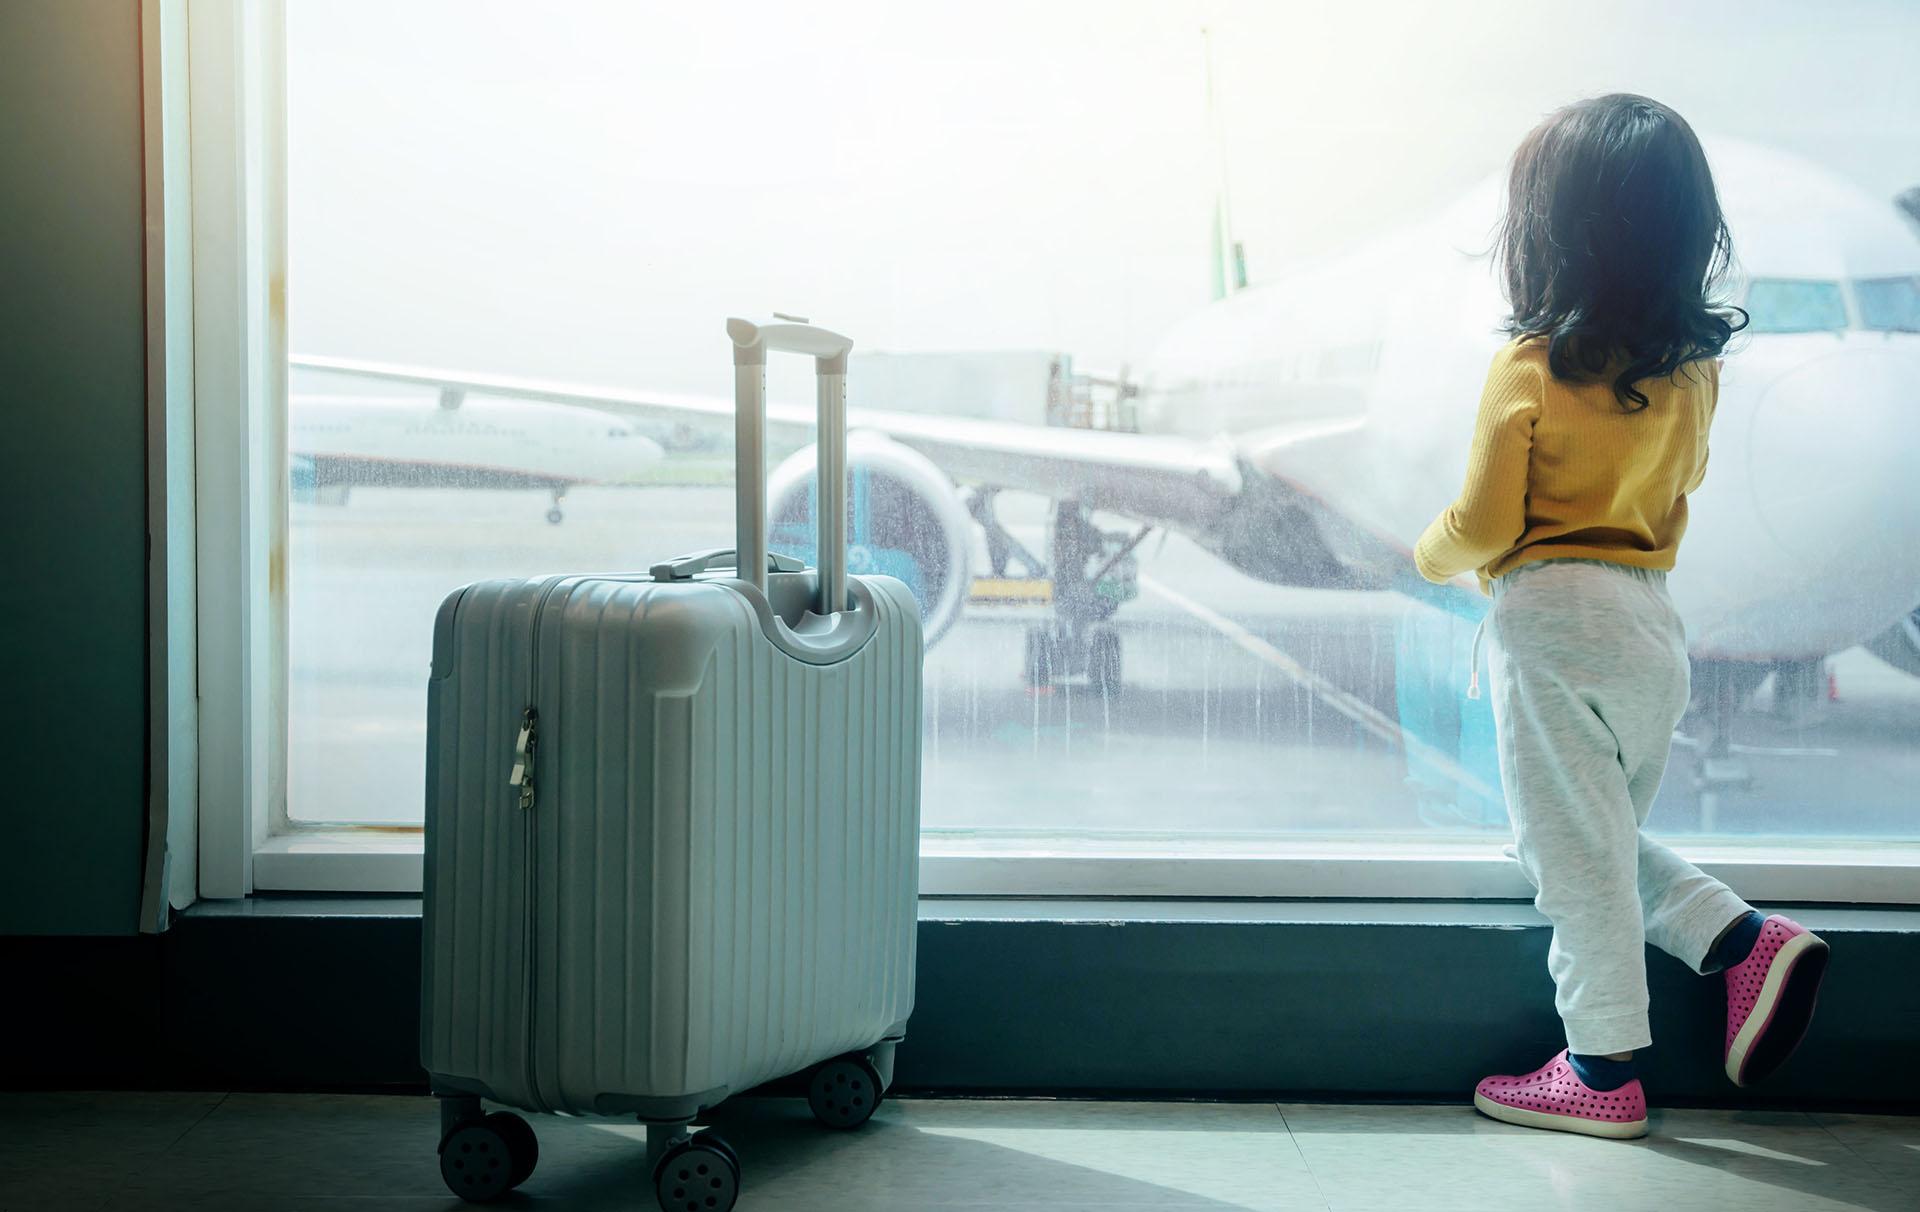 mum furious at airline employee mocking daughter